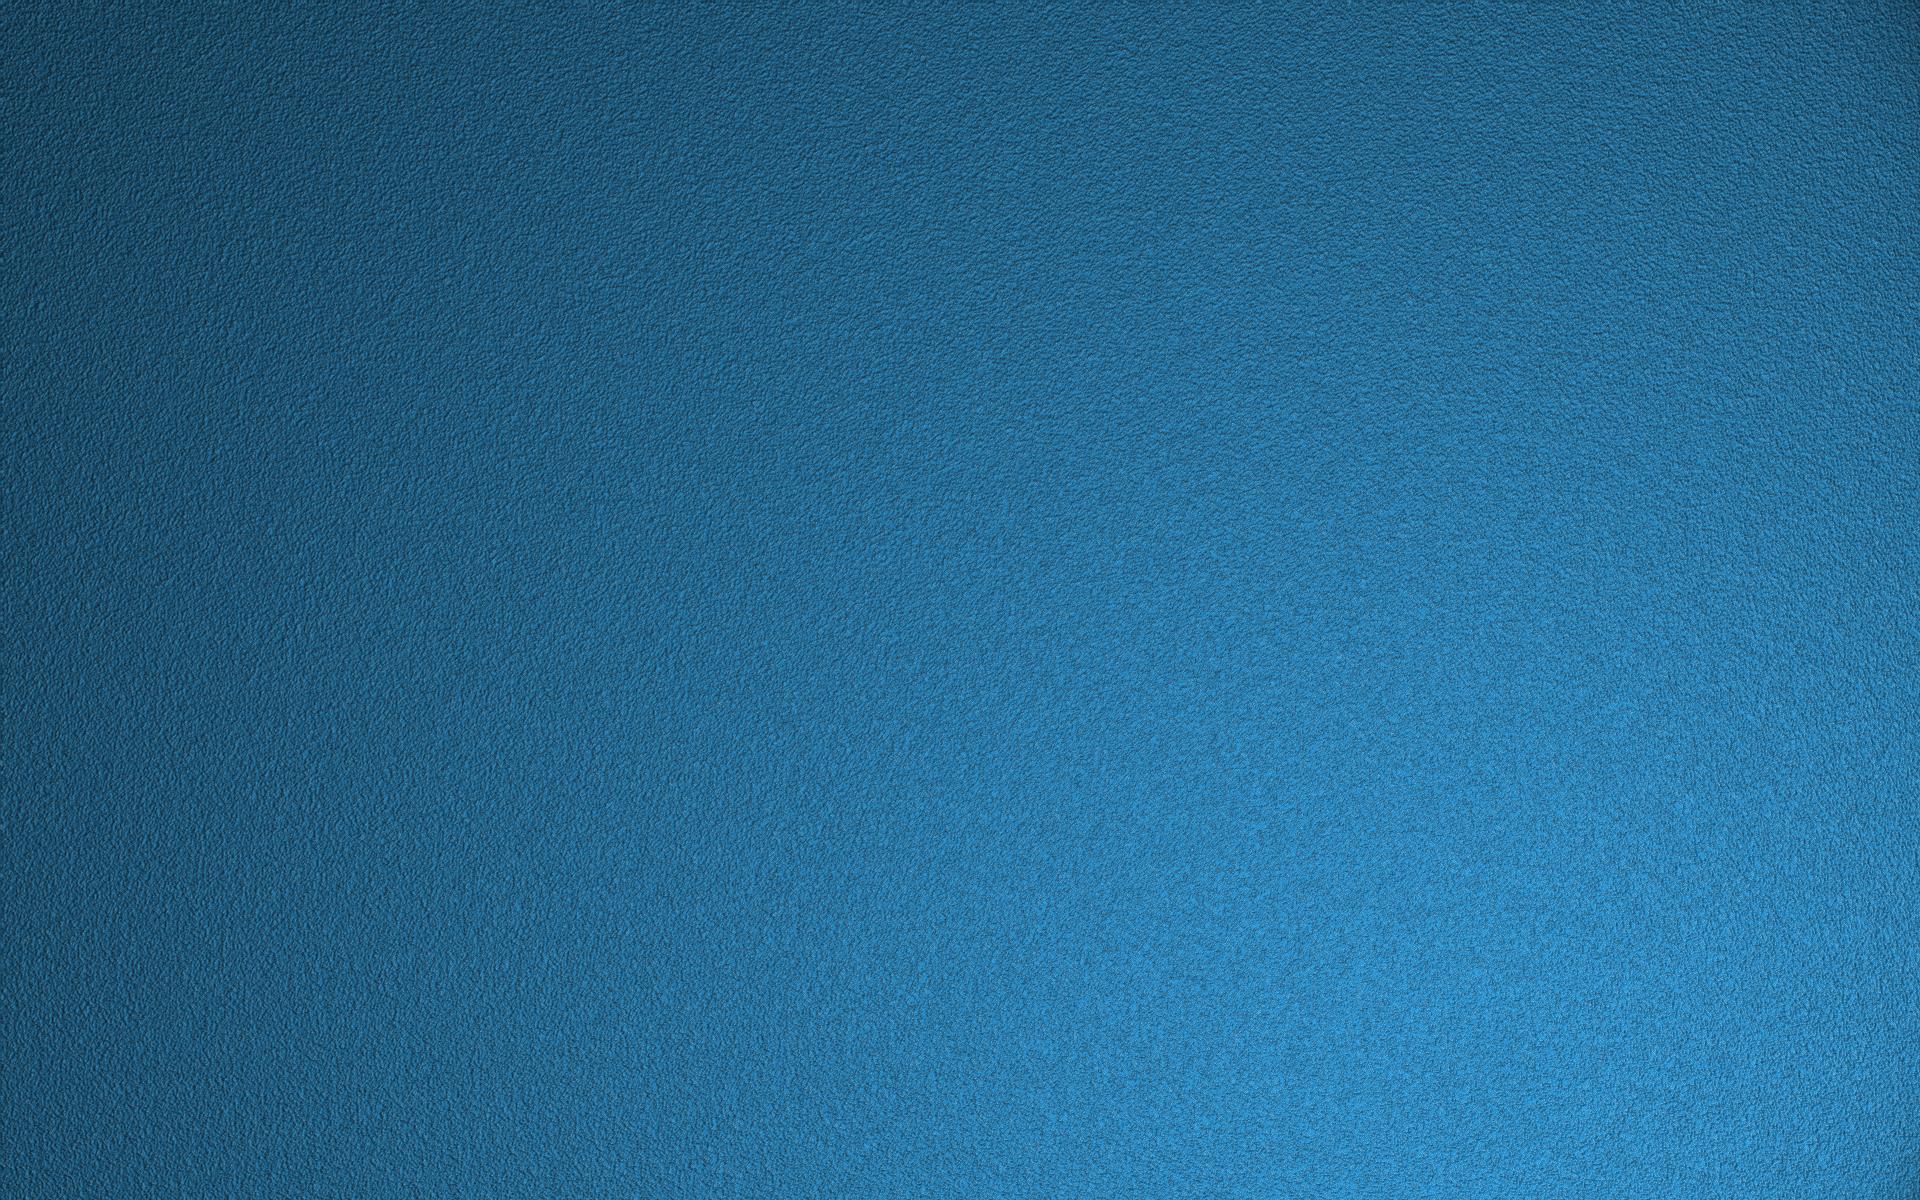 форма лазурно синий картинки нашли